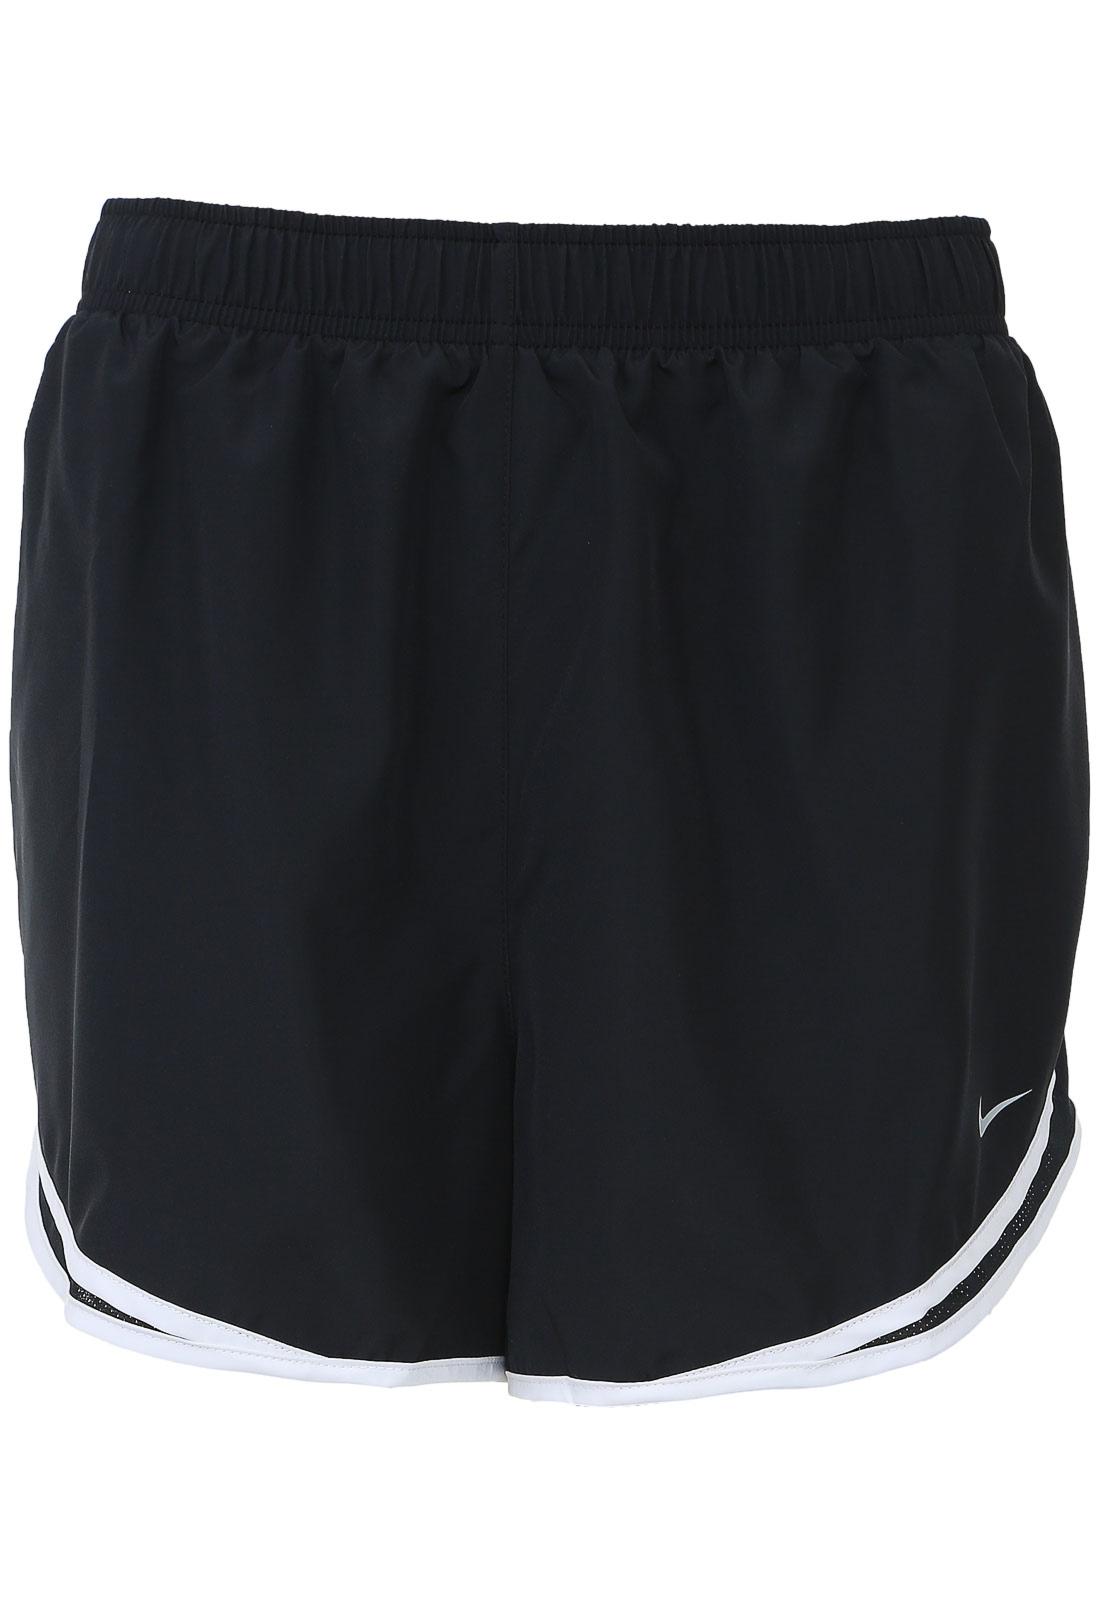 Imagem - Short Nike Feminino Running Plus Size